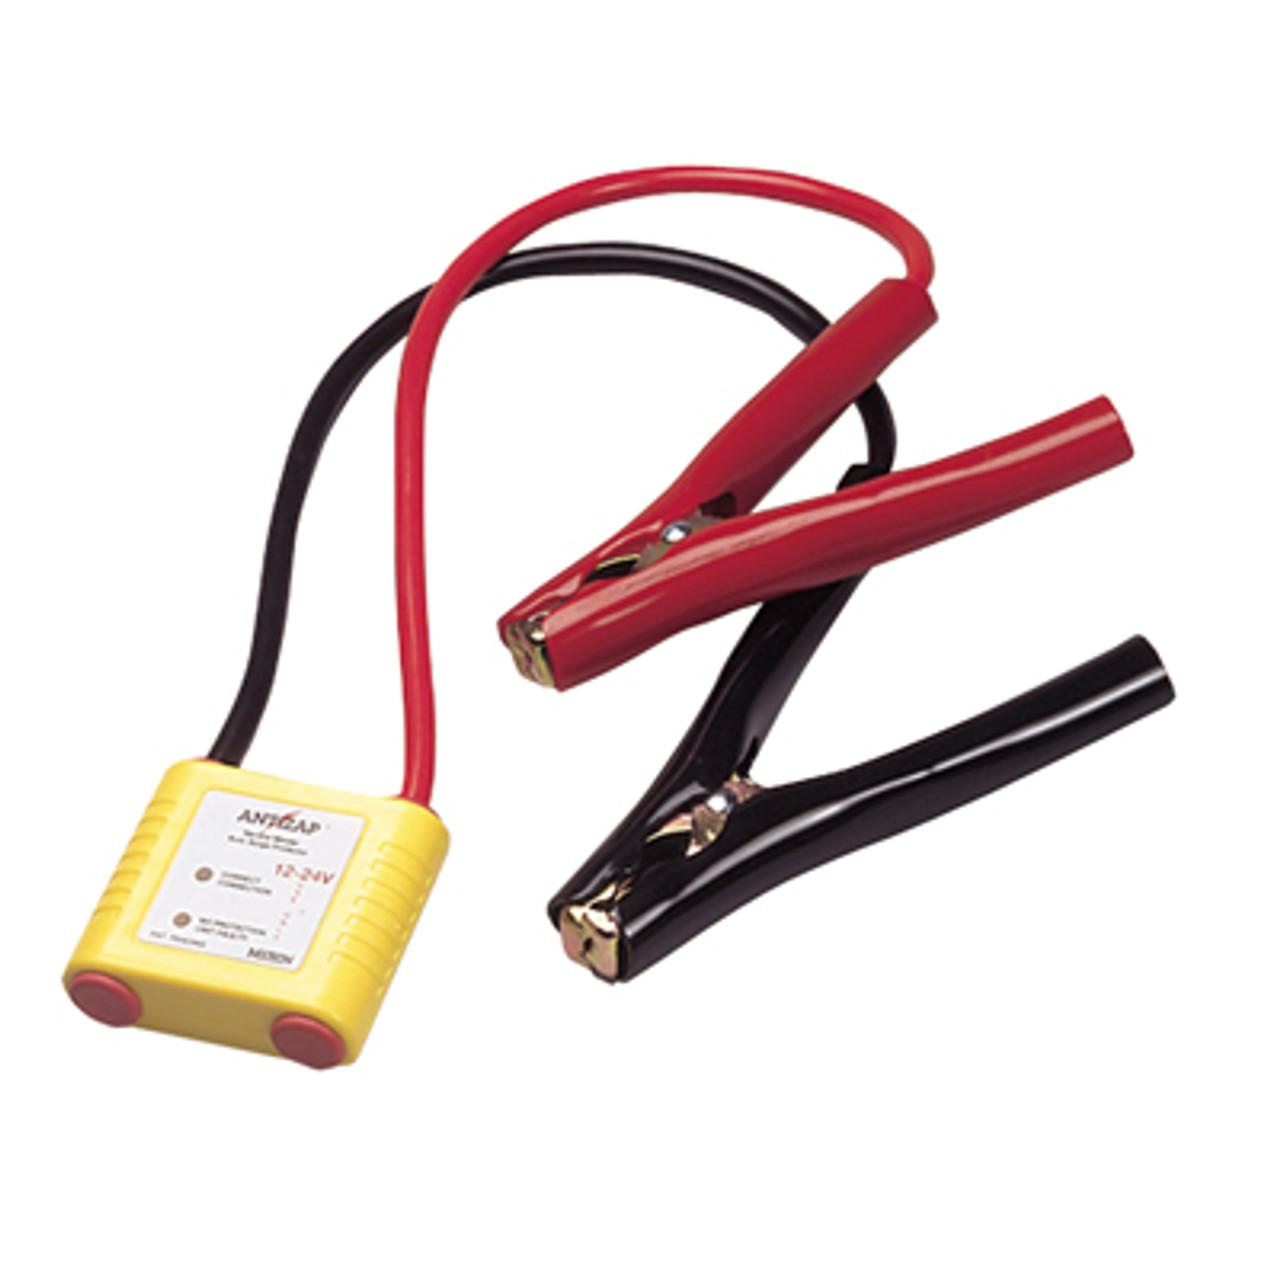 OTC 3386 Kit Antizap Surge Protector